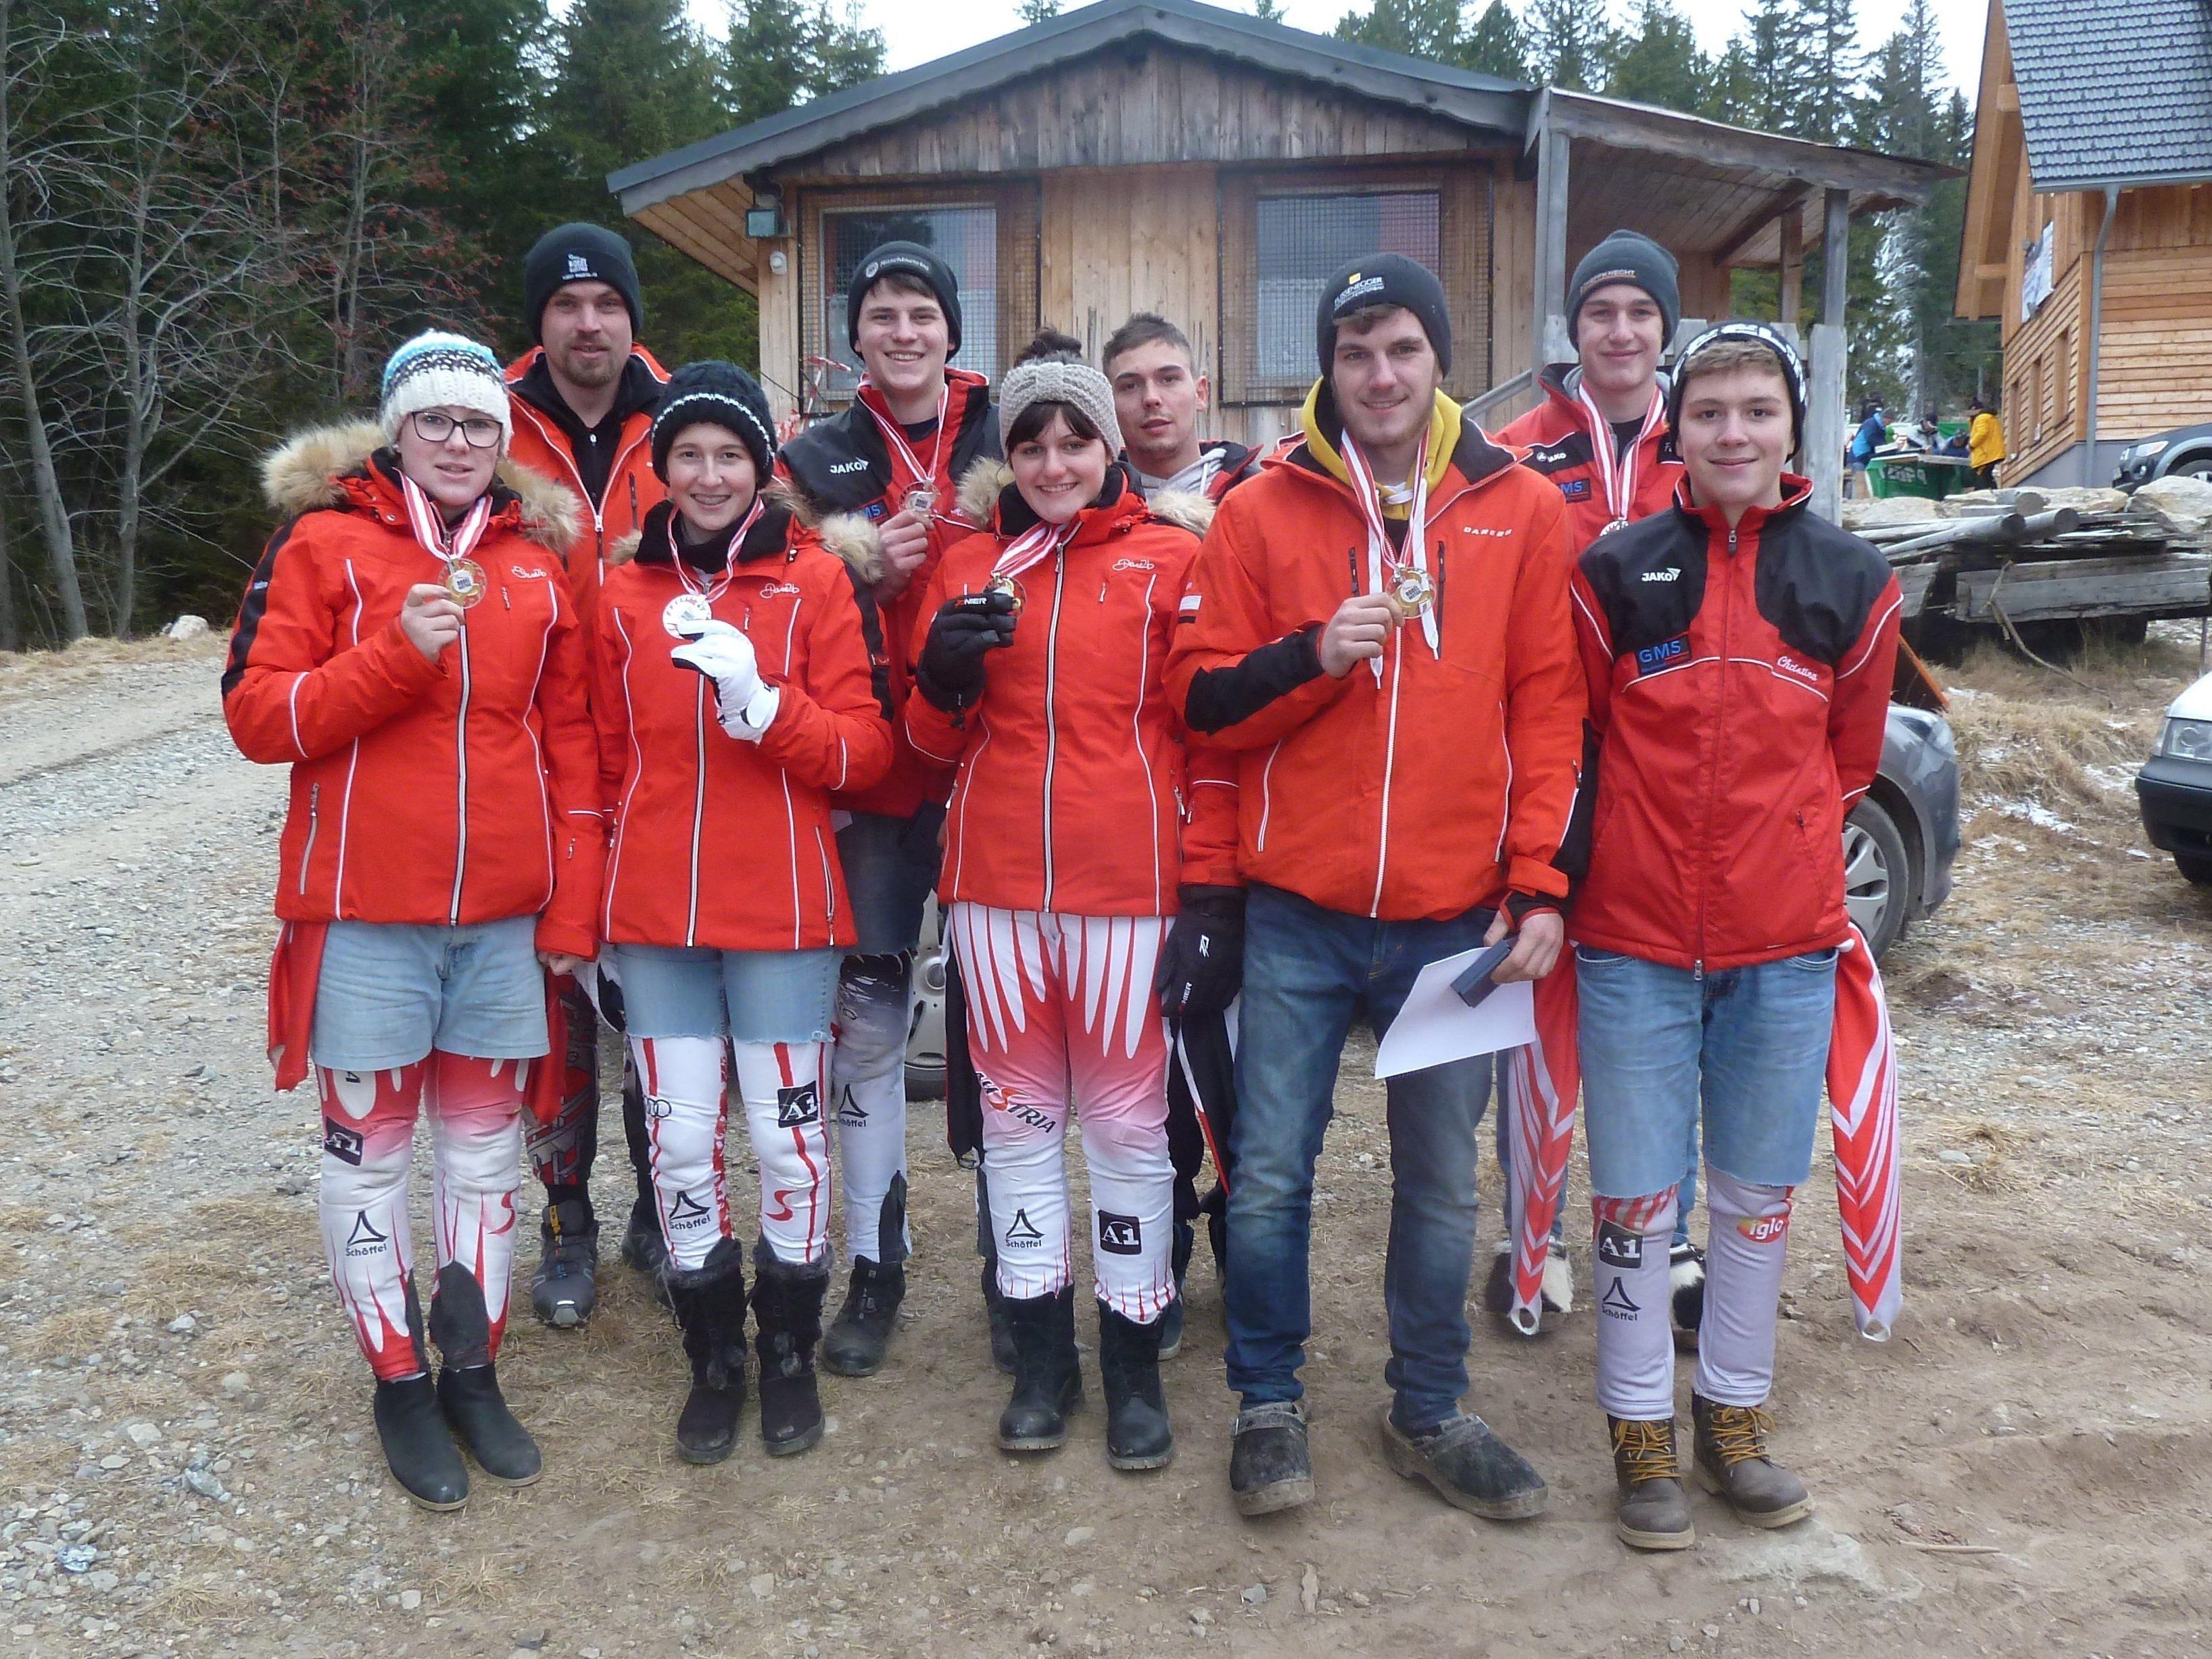 Rodelclub Dornbirn Austria Cup 2016/17